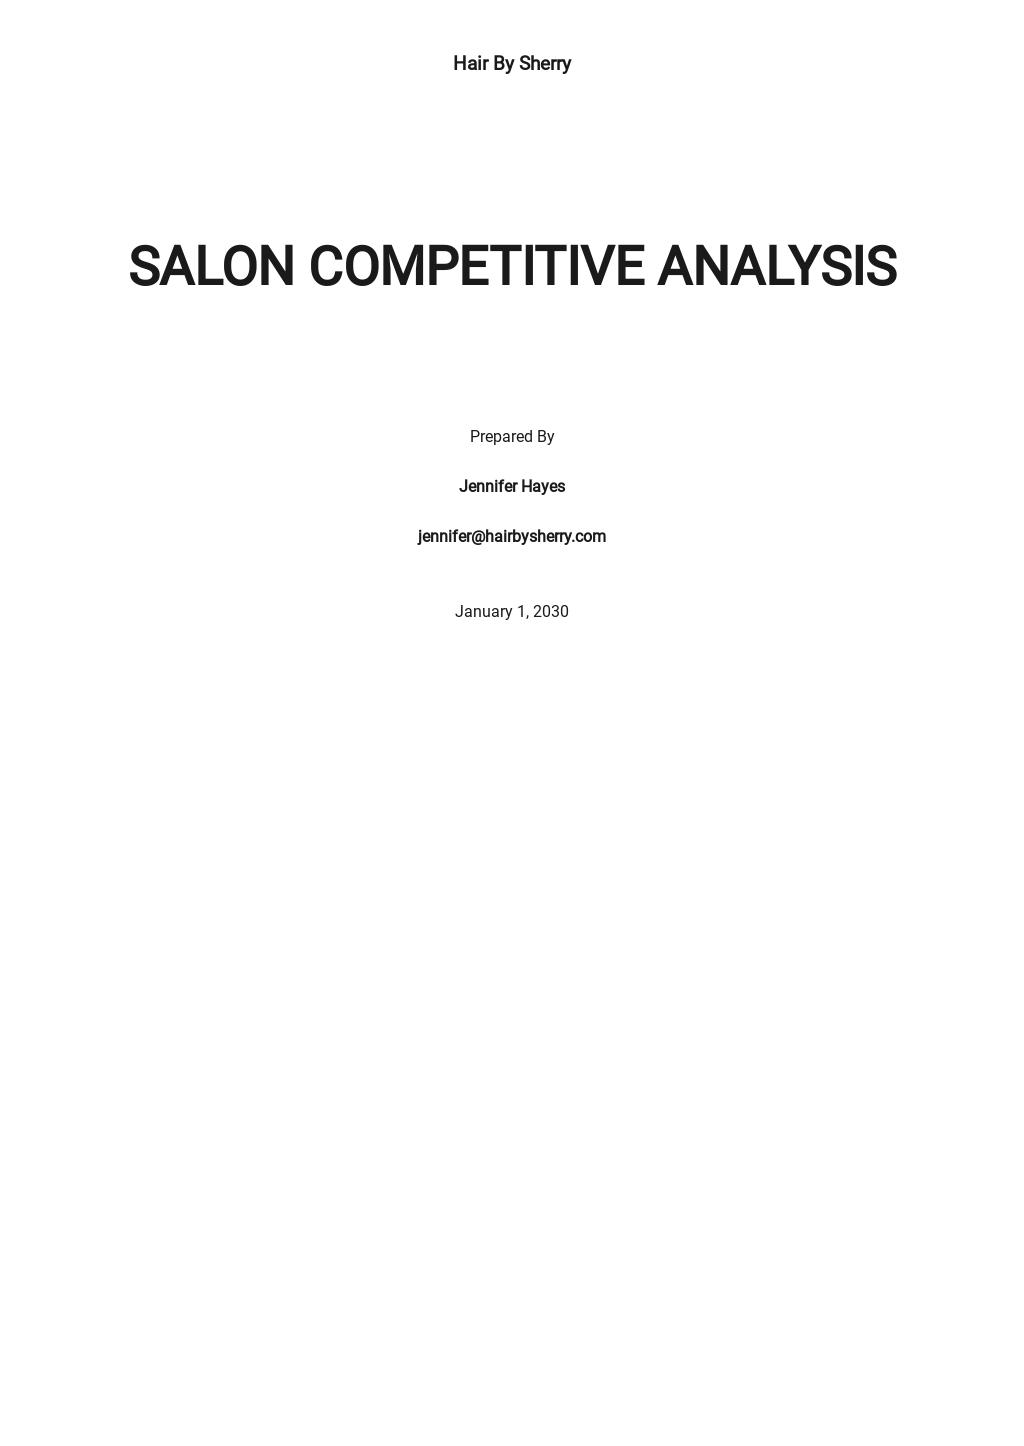 Salon competitive analysis template.jpe